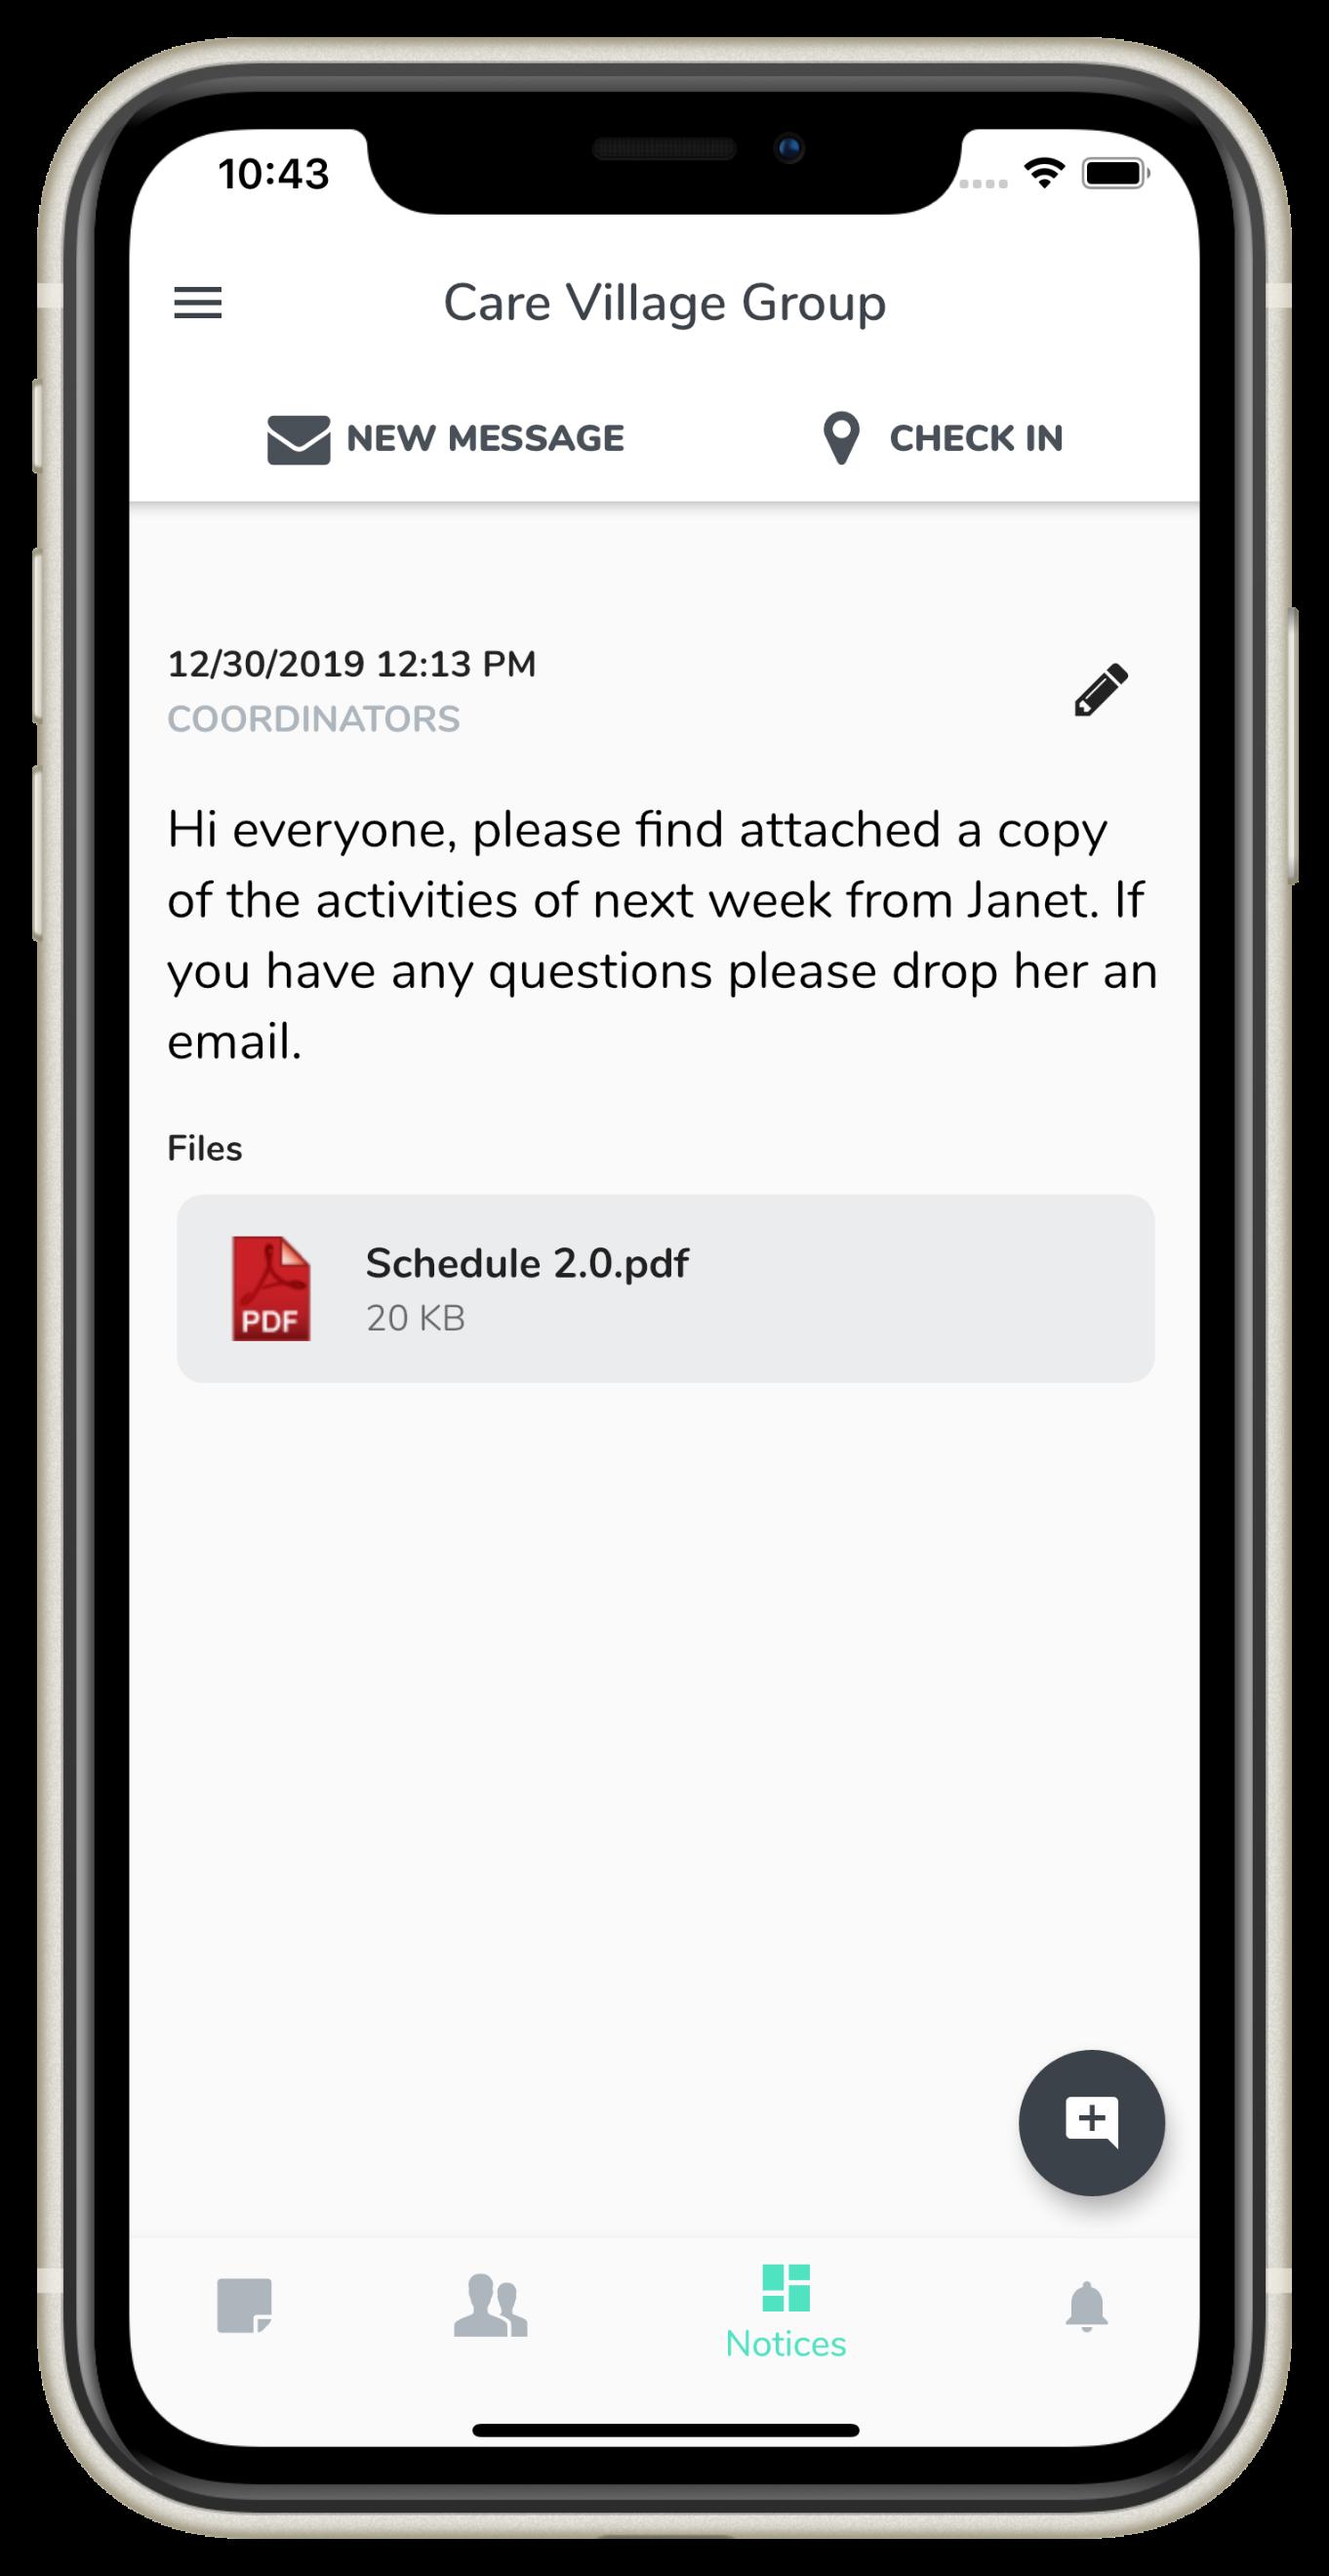 ca20_web_screenshot_iphone_006